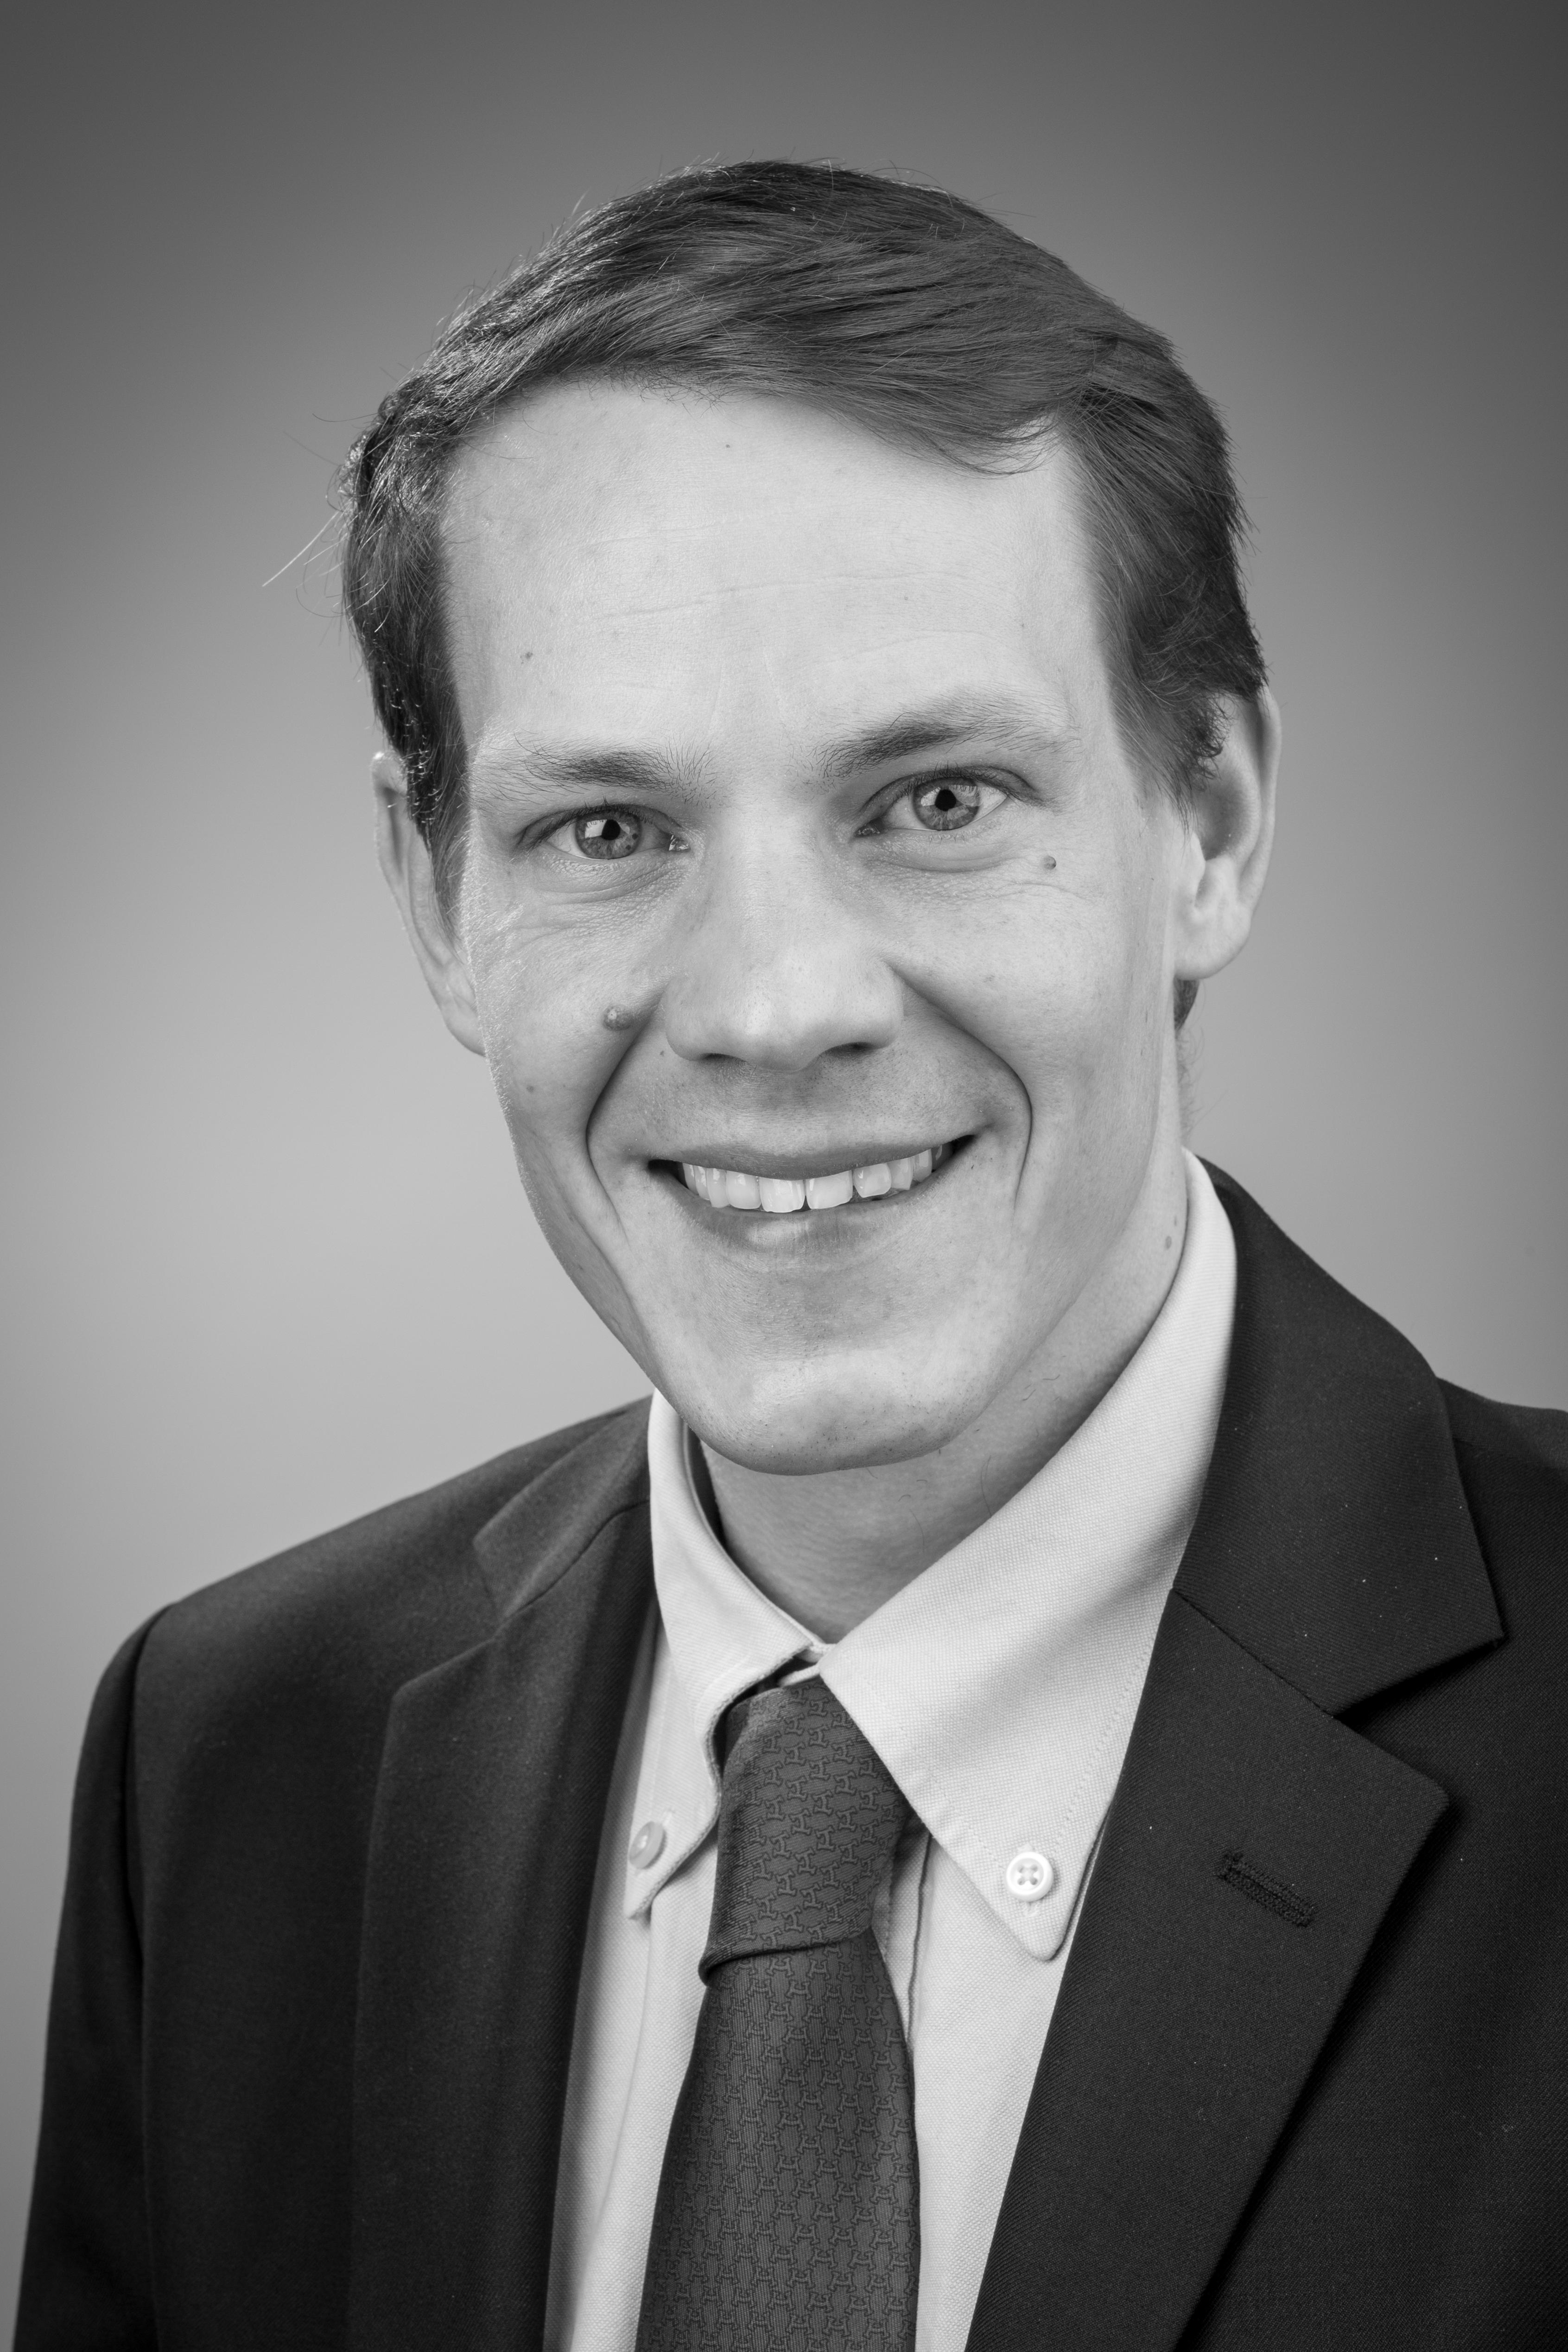 Nicolas Rosseeuw